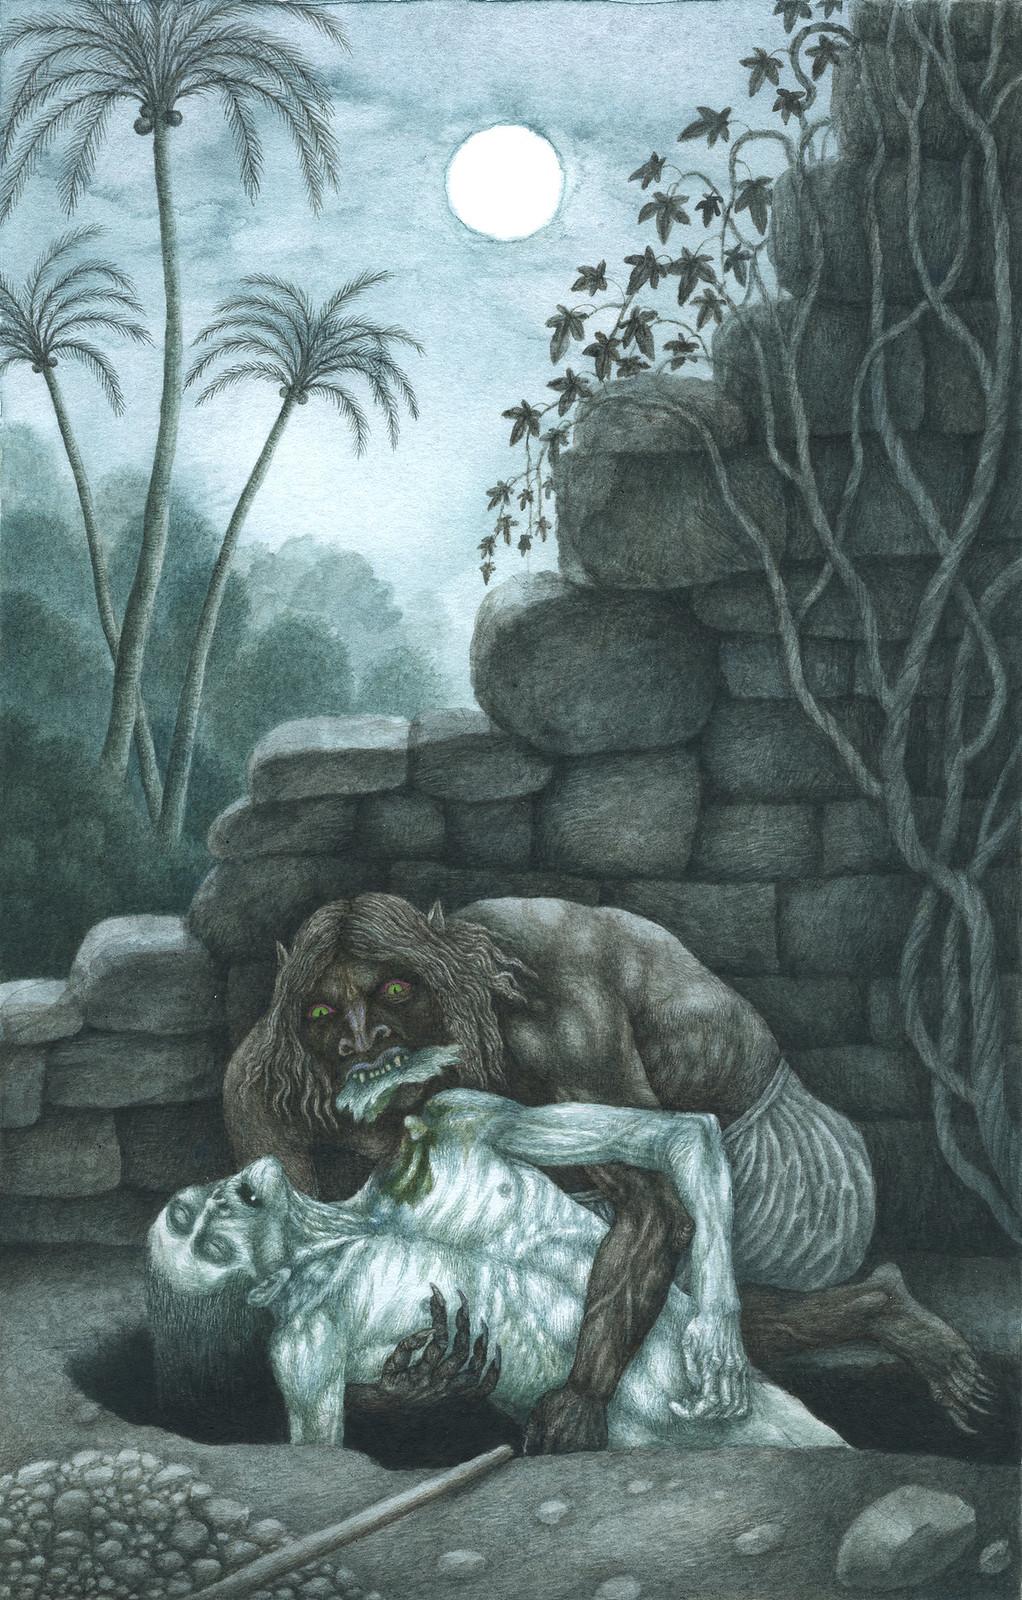 Jindra Capek - Fairy Tales of the World, Illustration 3